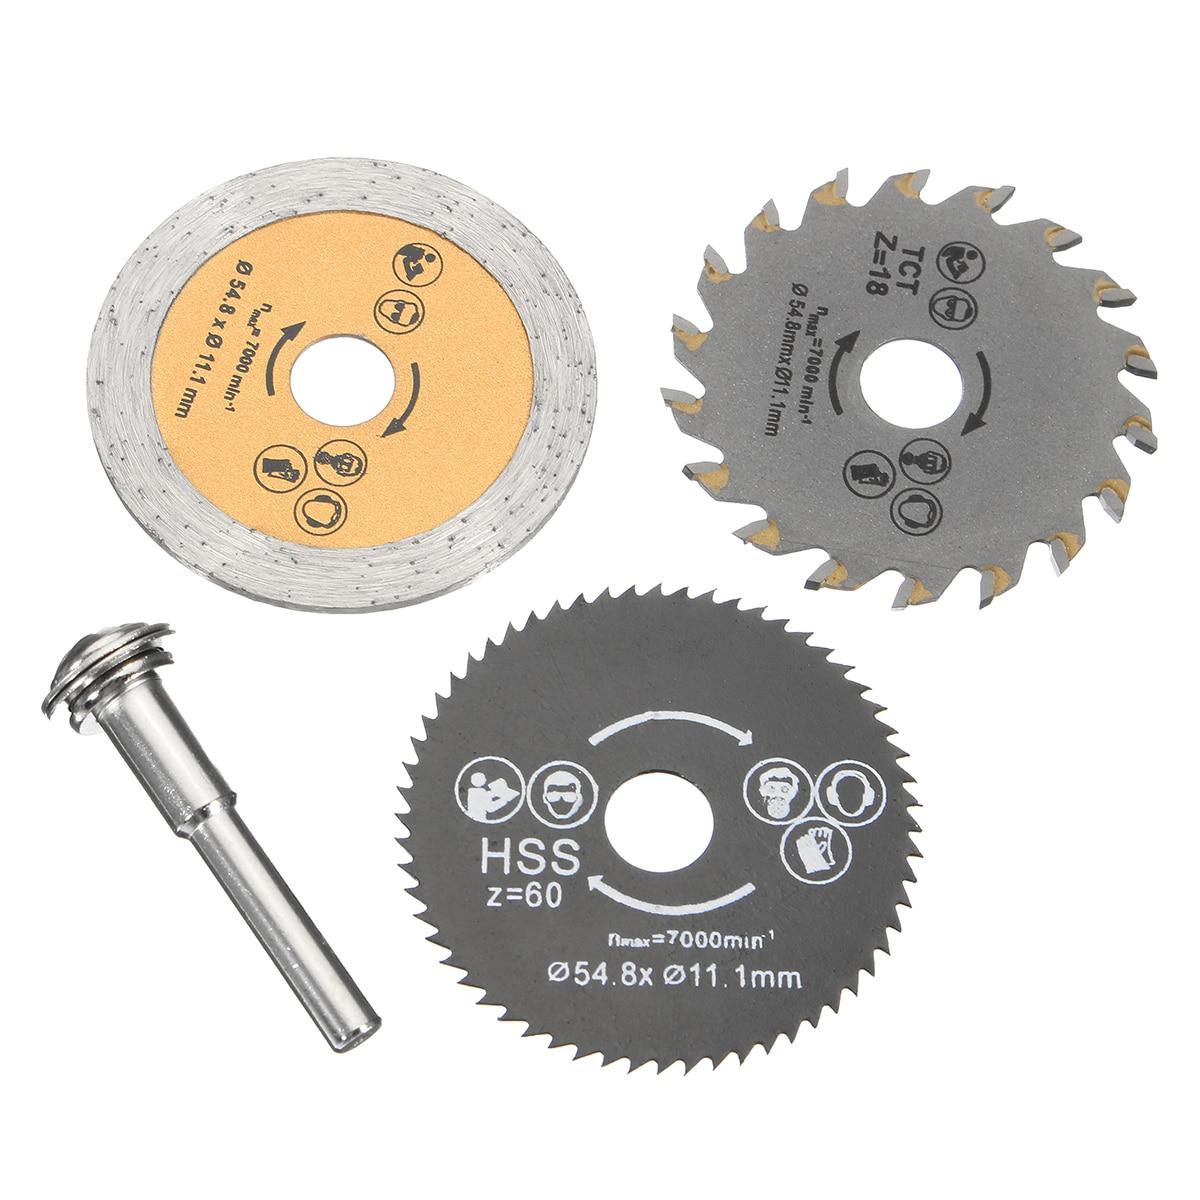 3Pcs Circular Saw Blade Cutting Disc HSS Cutter Disc Shank For Mini Drill Tools Wood Drills Tools Out Diameter 54.8mm